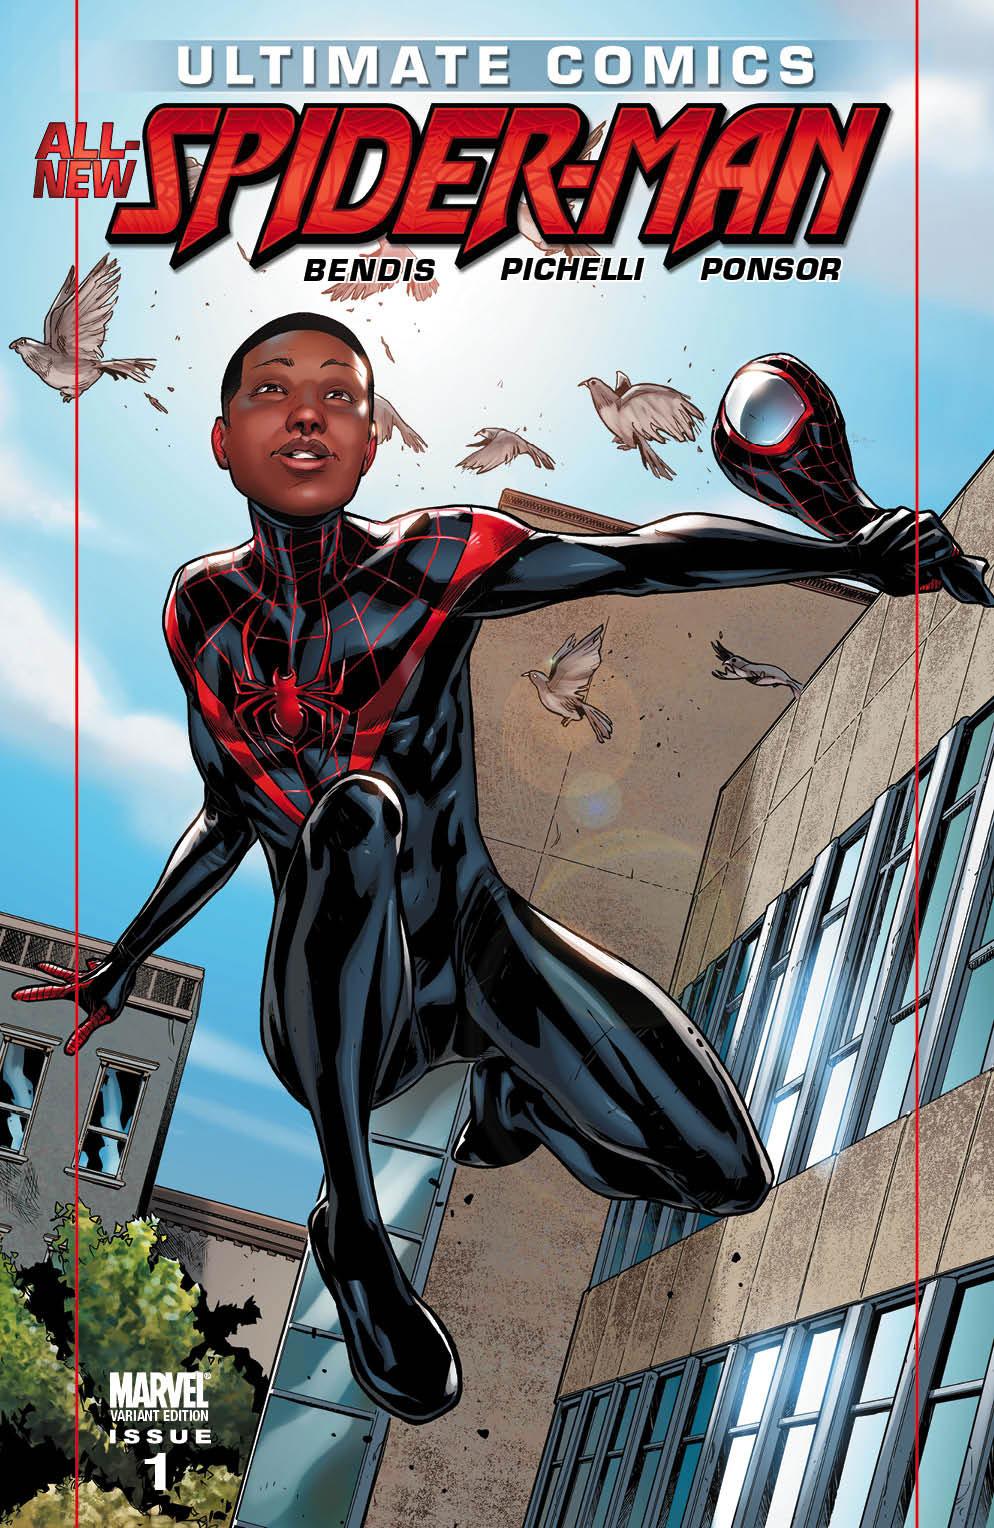 Black Spiderman Comic  black Spider-Man  is